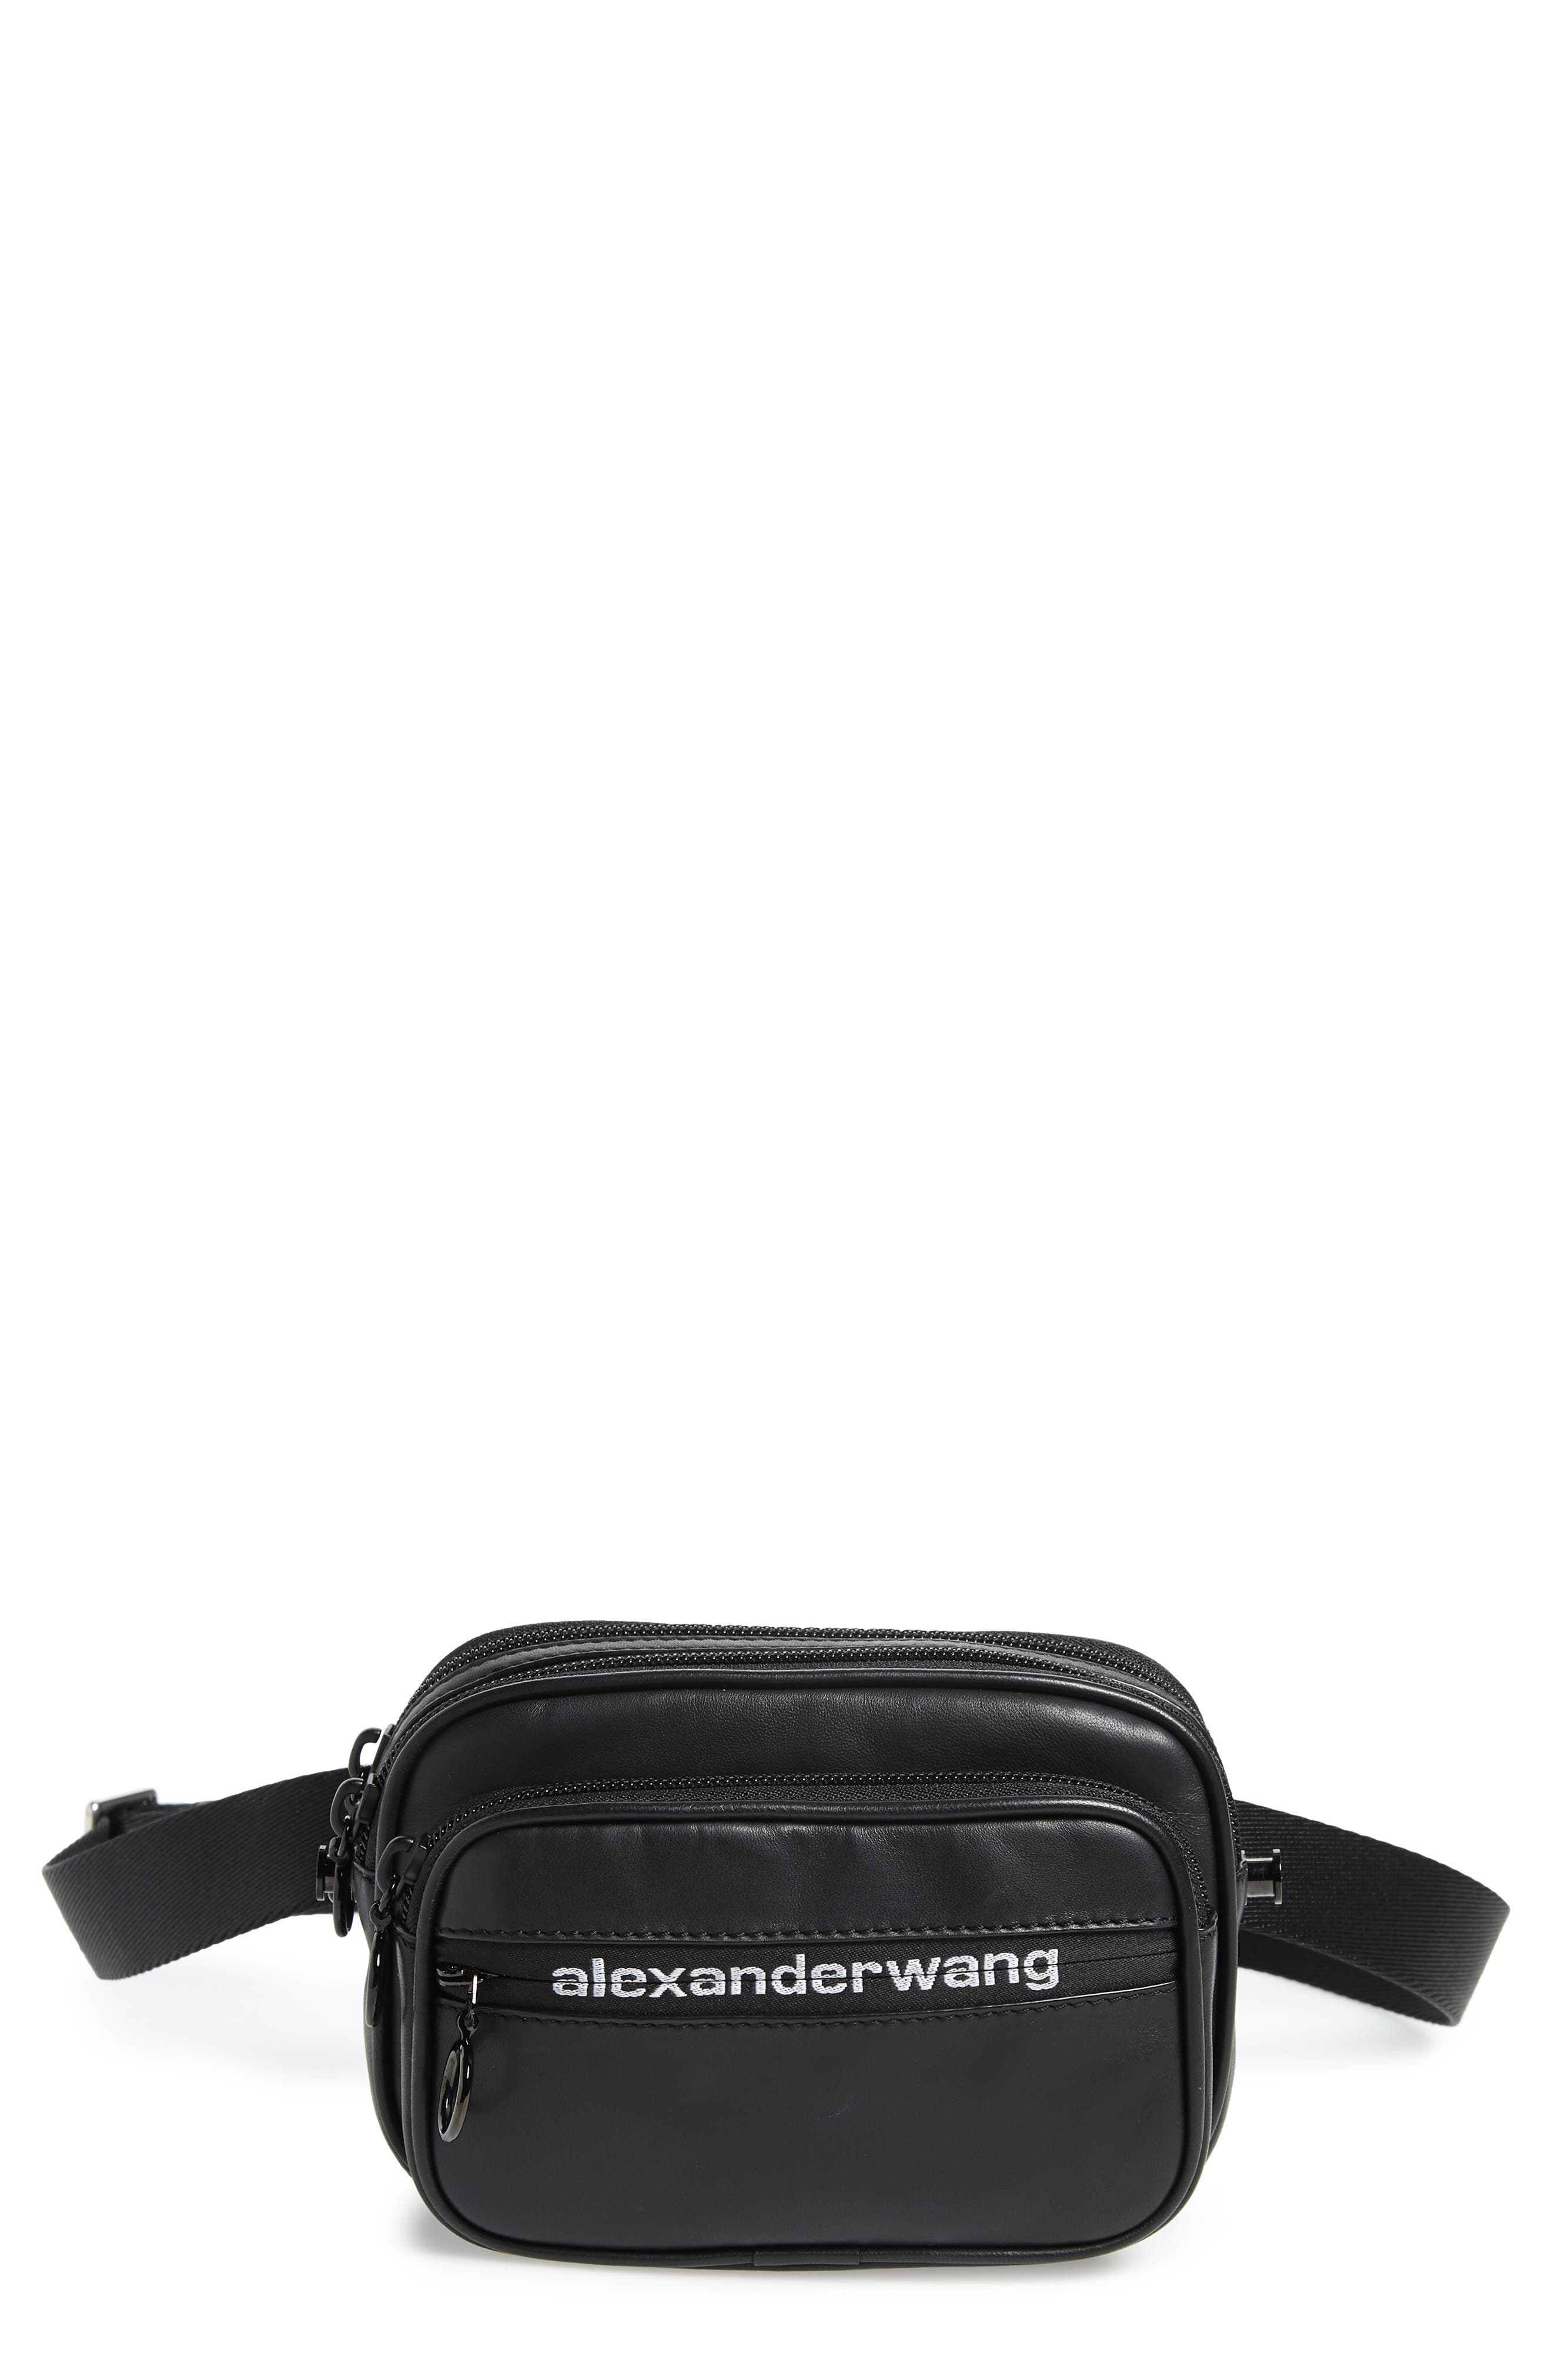 ALEXANDER WANG Attica Logo Leather Belt Bag, Main, color, BLACK